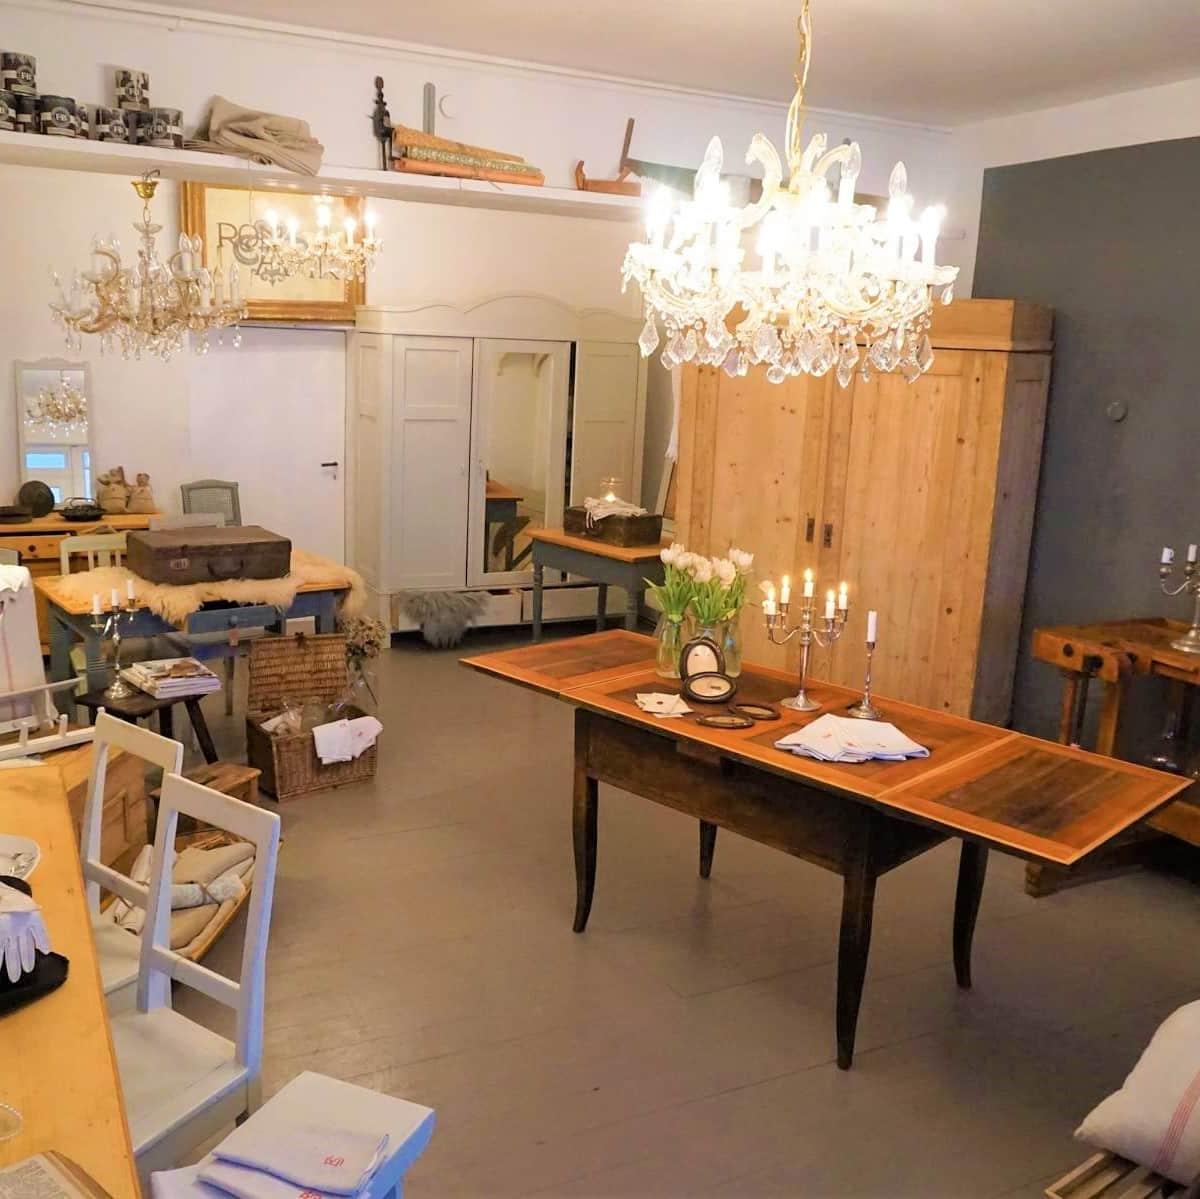 Style Hannover RomAntik Store - RomAntik - restaurierte Möbel & mehr